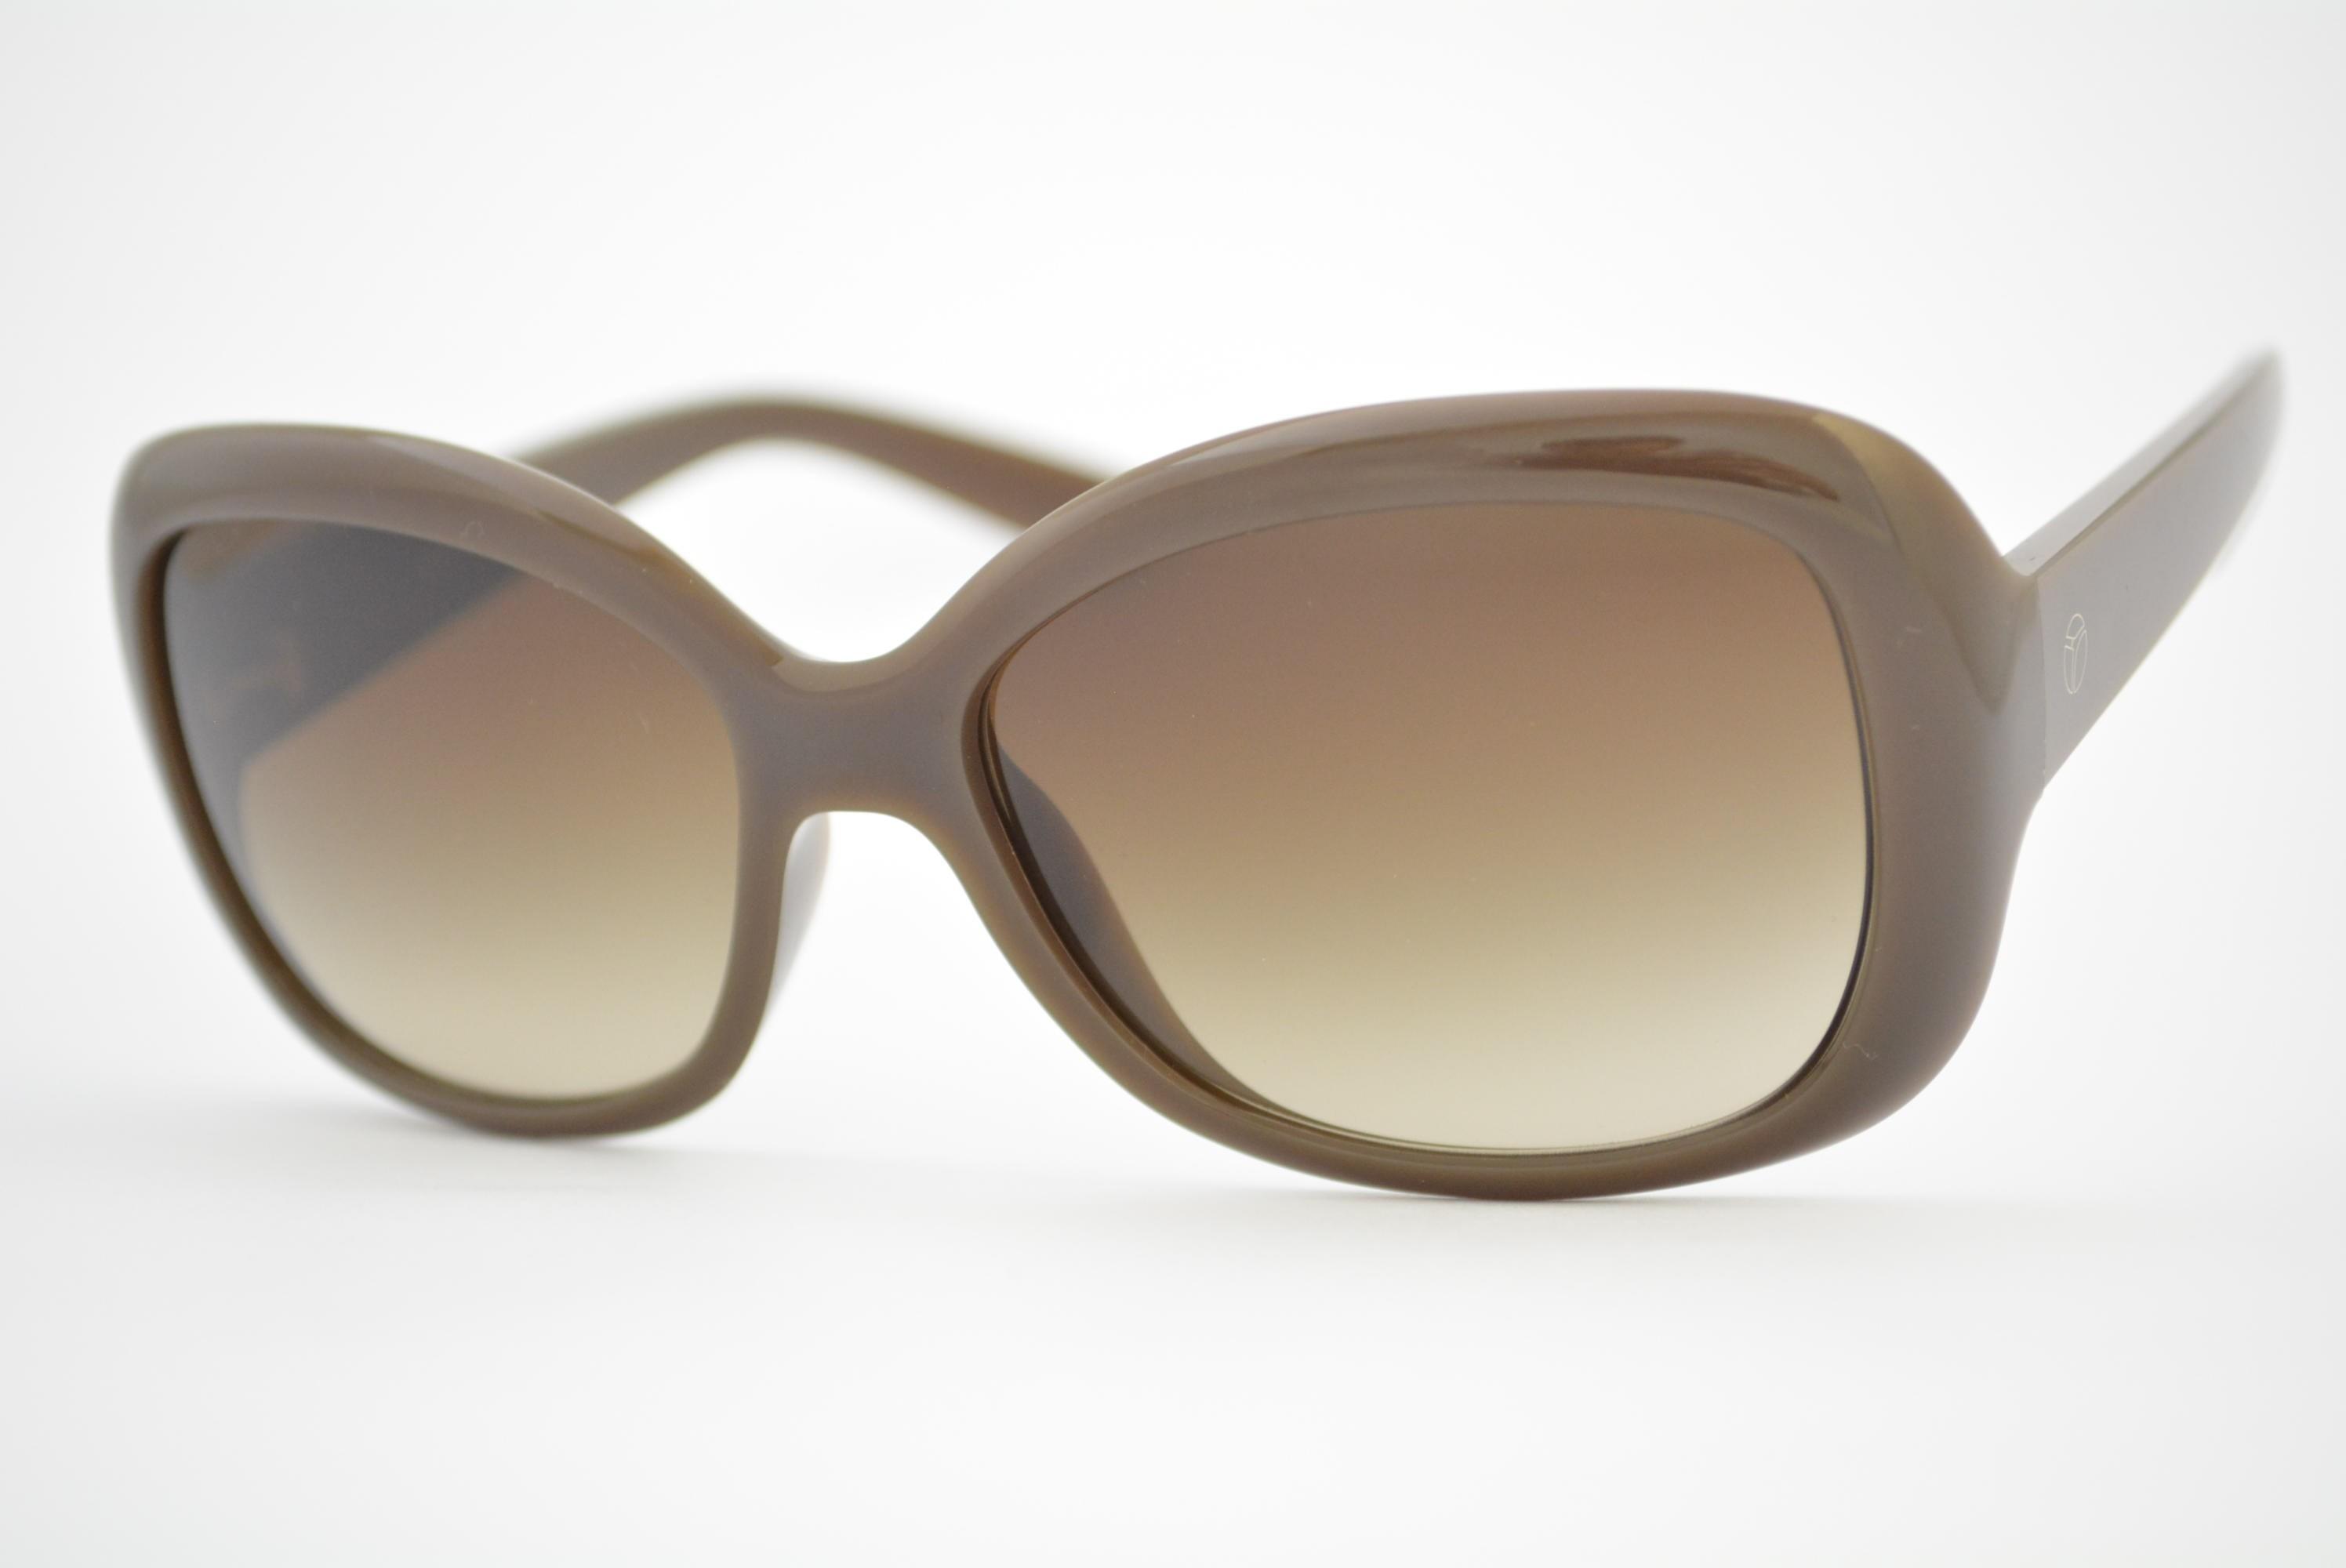 óculos de sol Tecnol mod tn4016 e798 Ótica Cardoso 5ad3b430ed